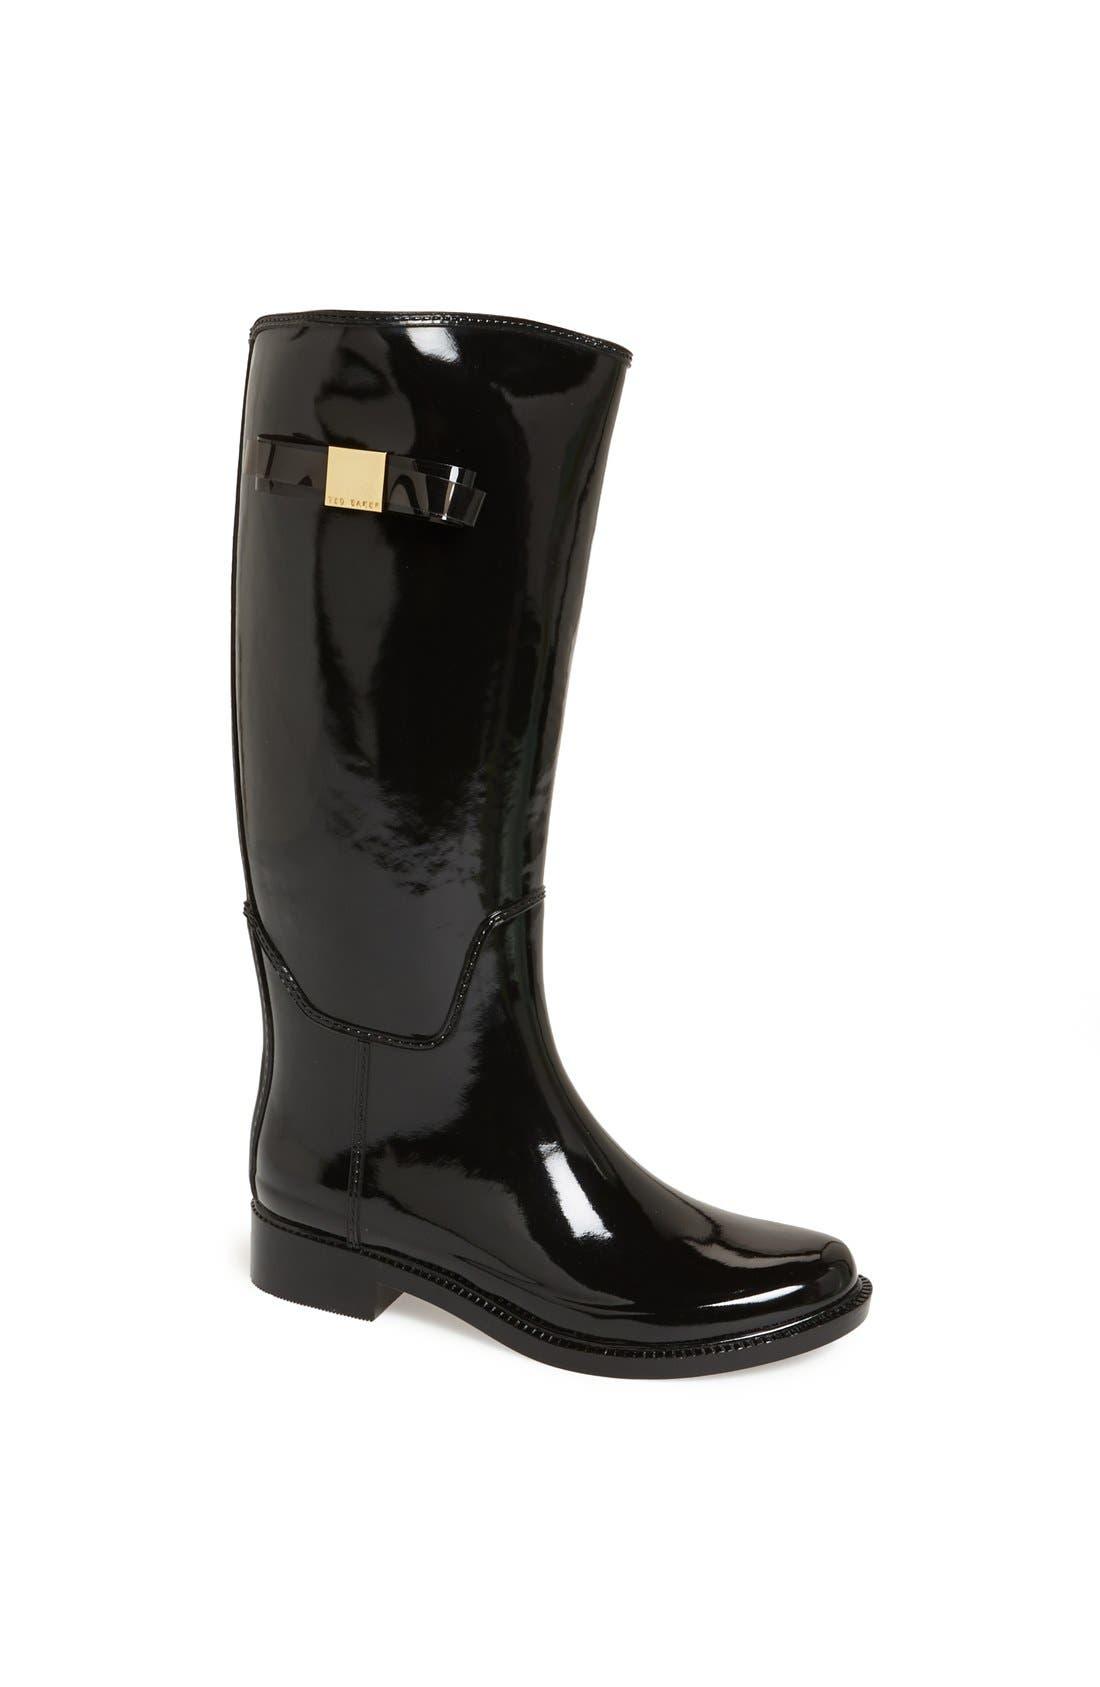 Main Image - Ted Baker London 'Scara' Rain Boot (Women)